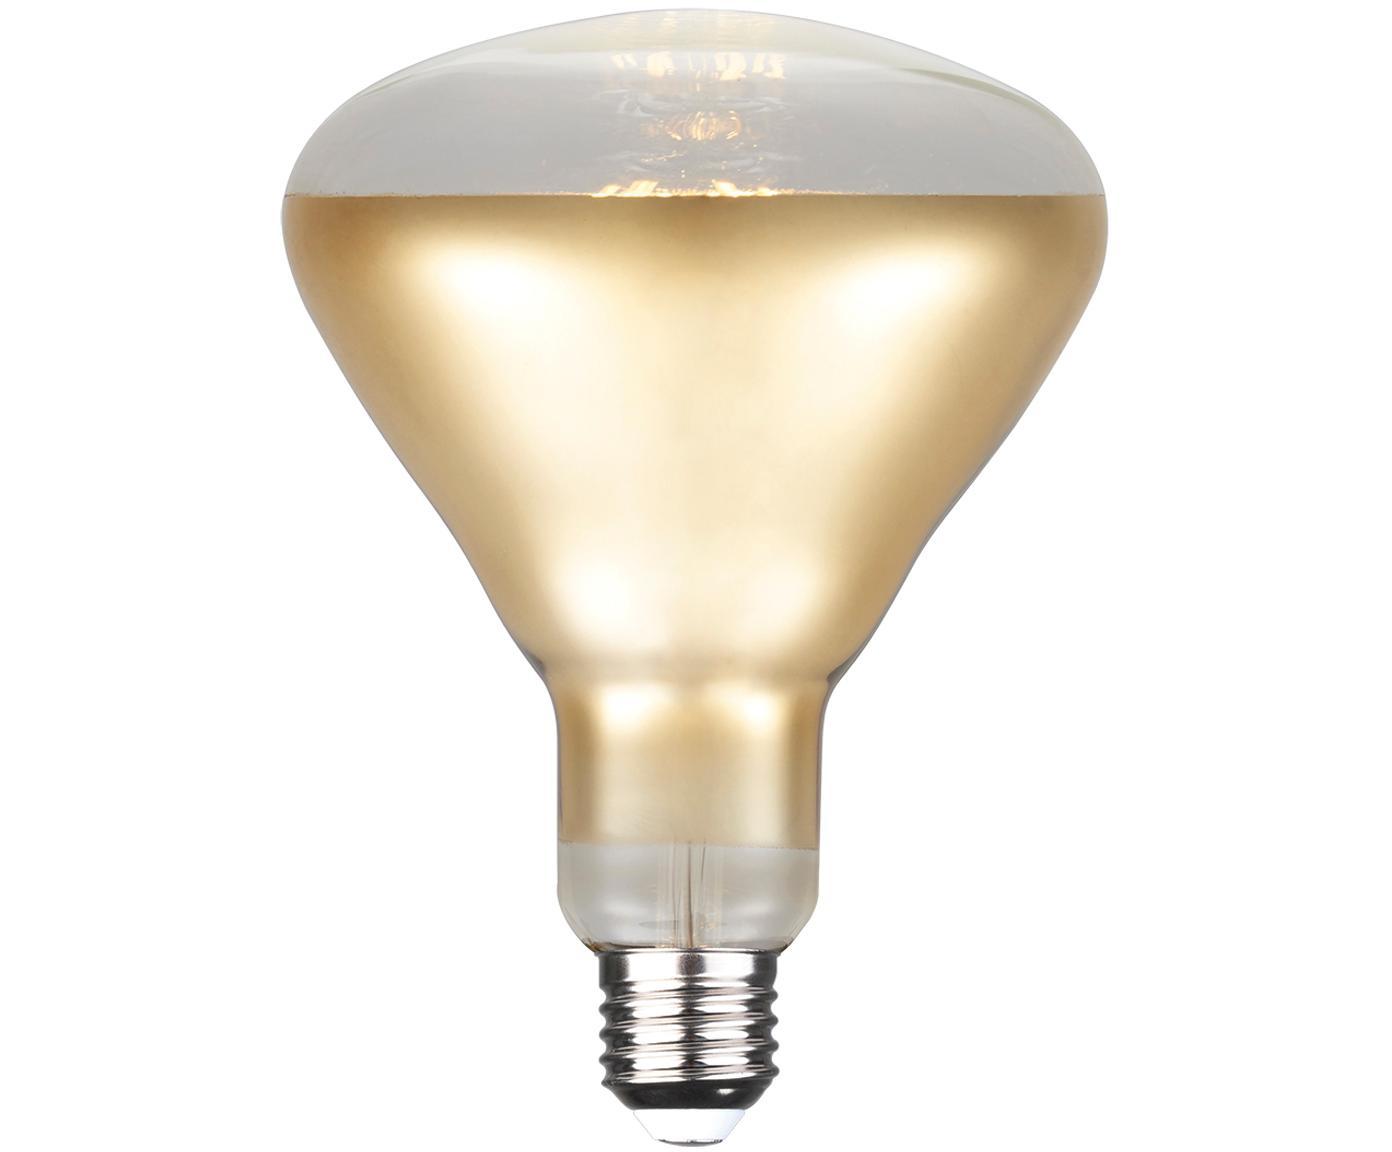 Lampadina a LED dimmerabile Reflektor (E27 / 7Watt), Lampadina: vetro, Dorato, Ø 13 x Alt. 17 cm